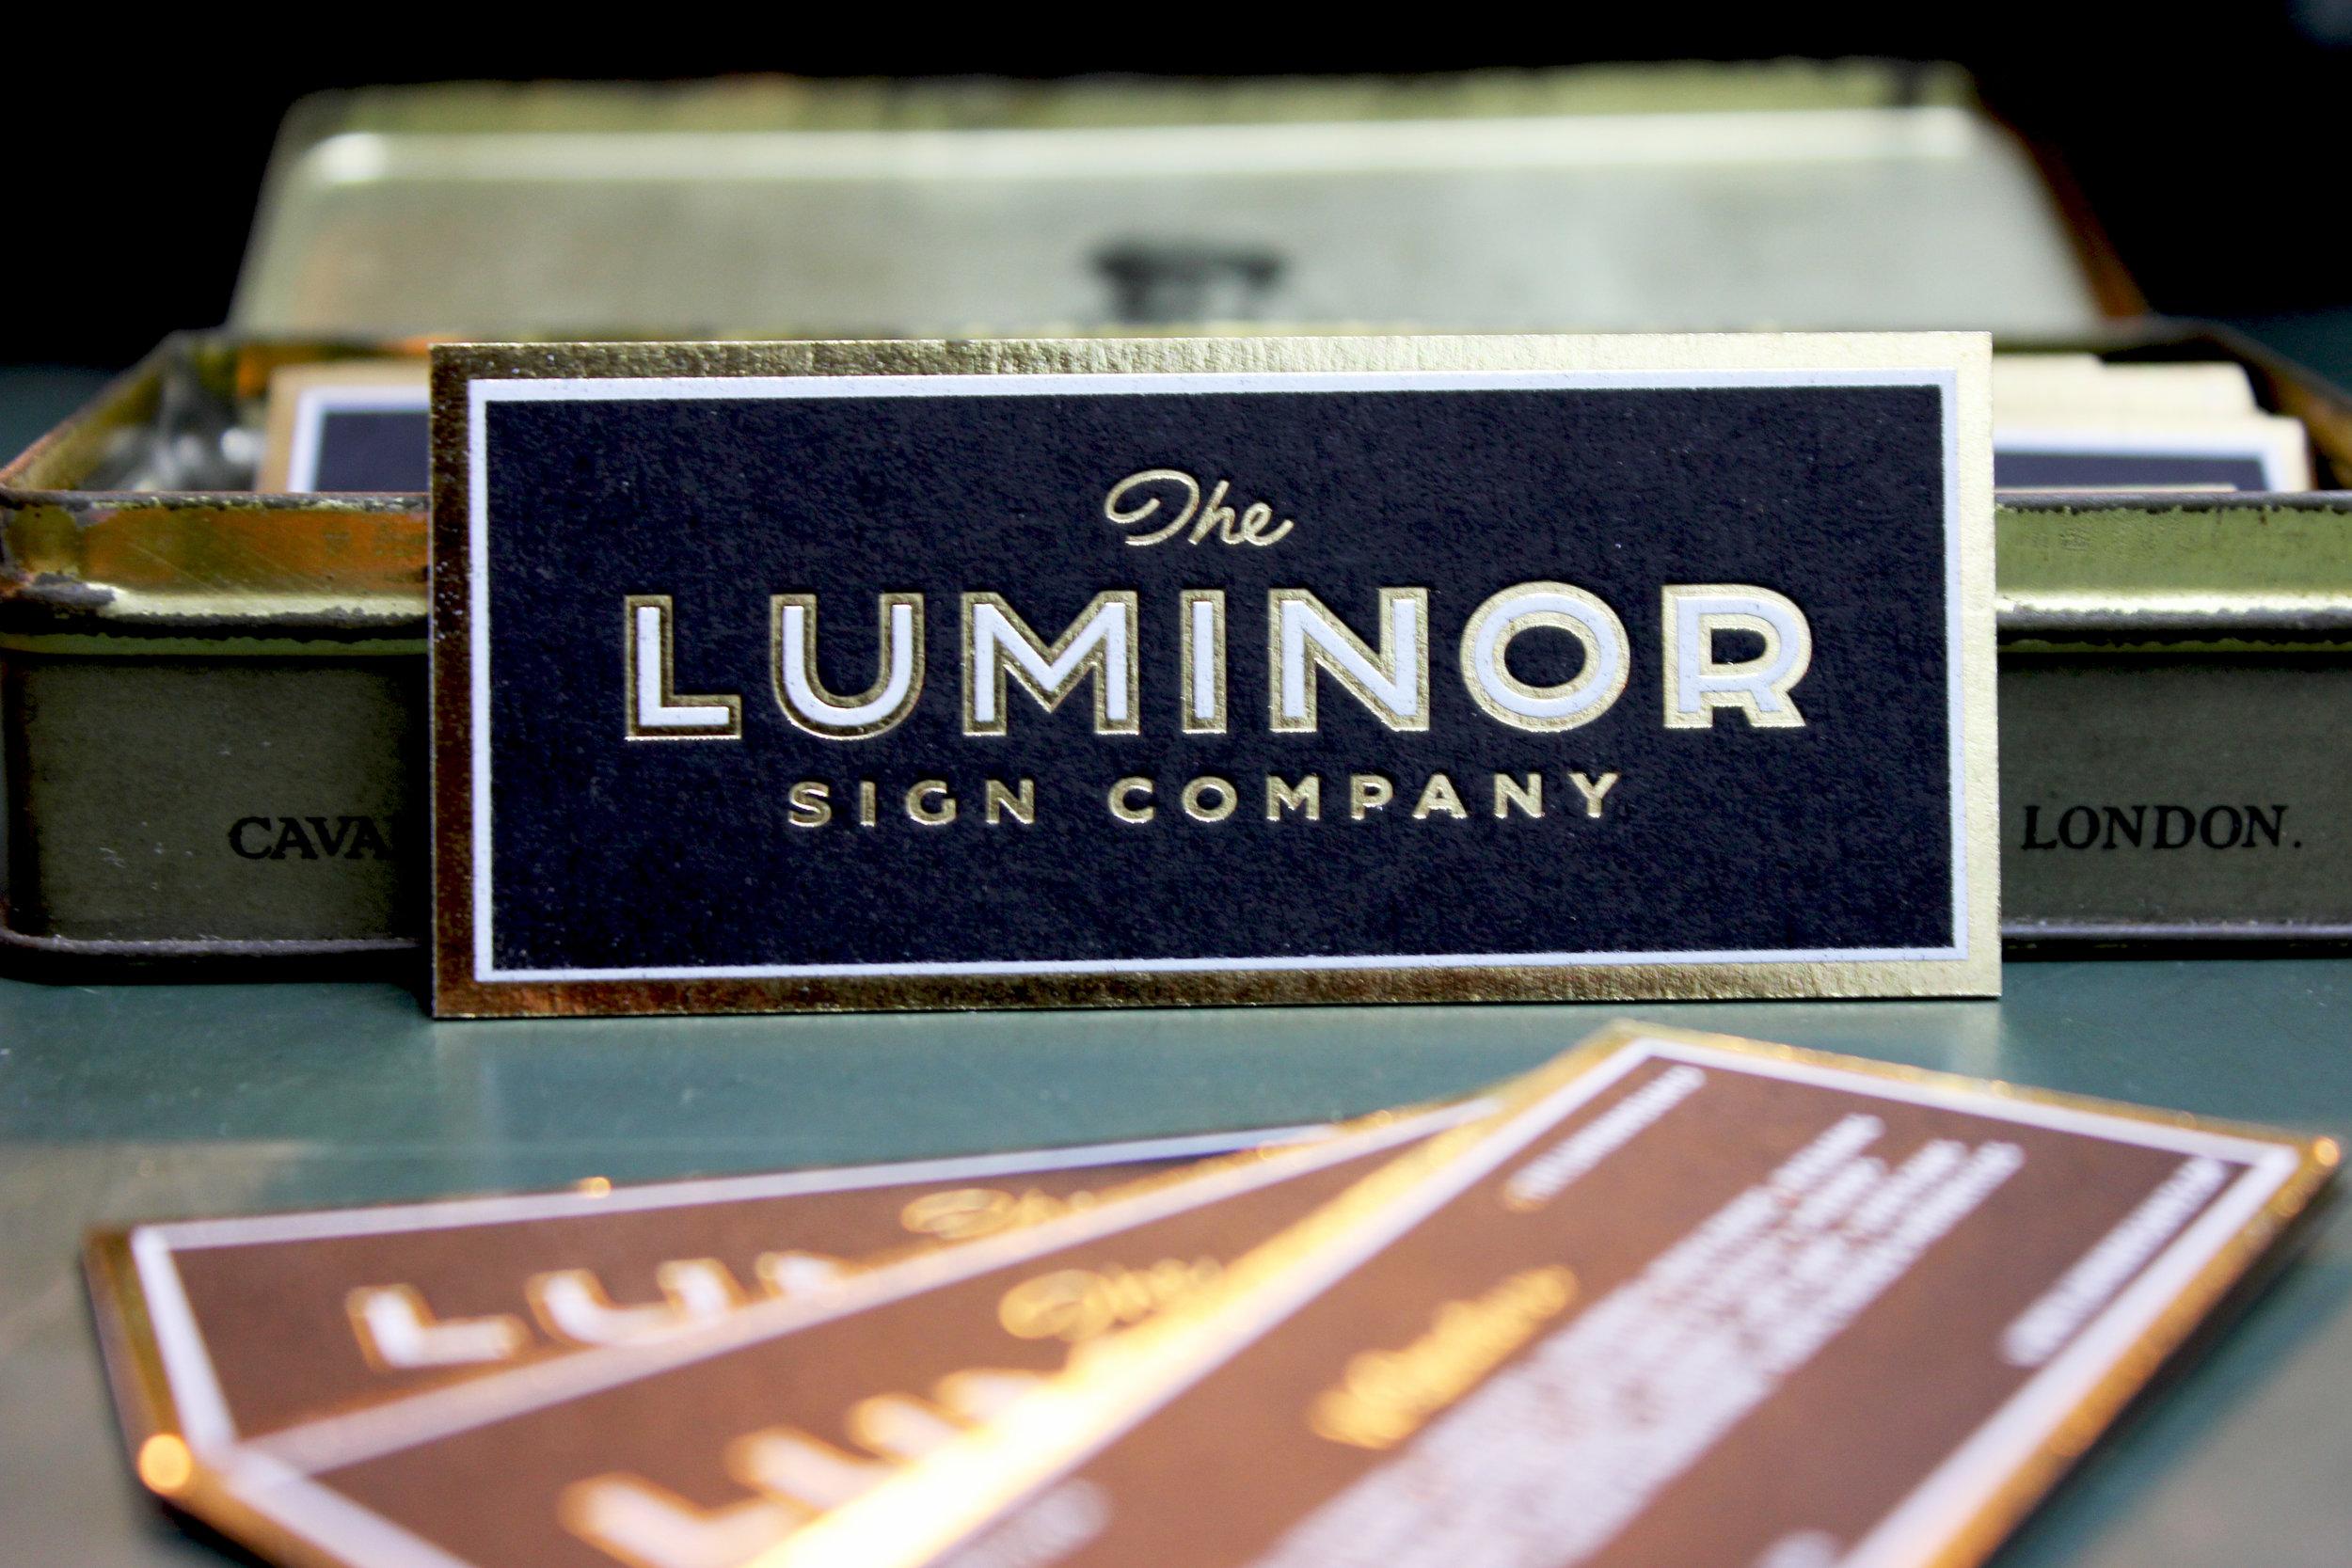 luminor sign co business cards ged palmer thomas mayo